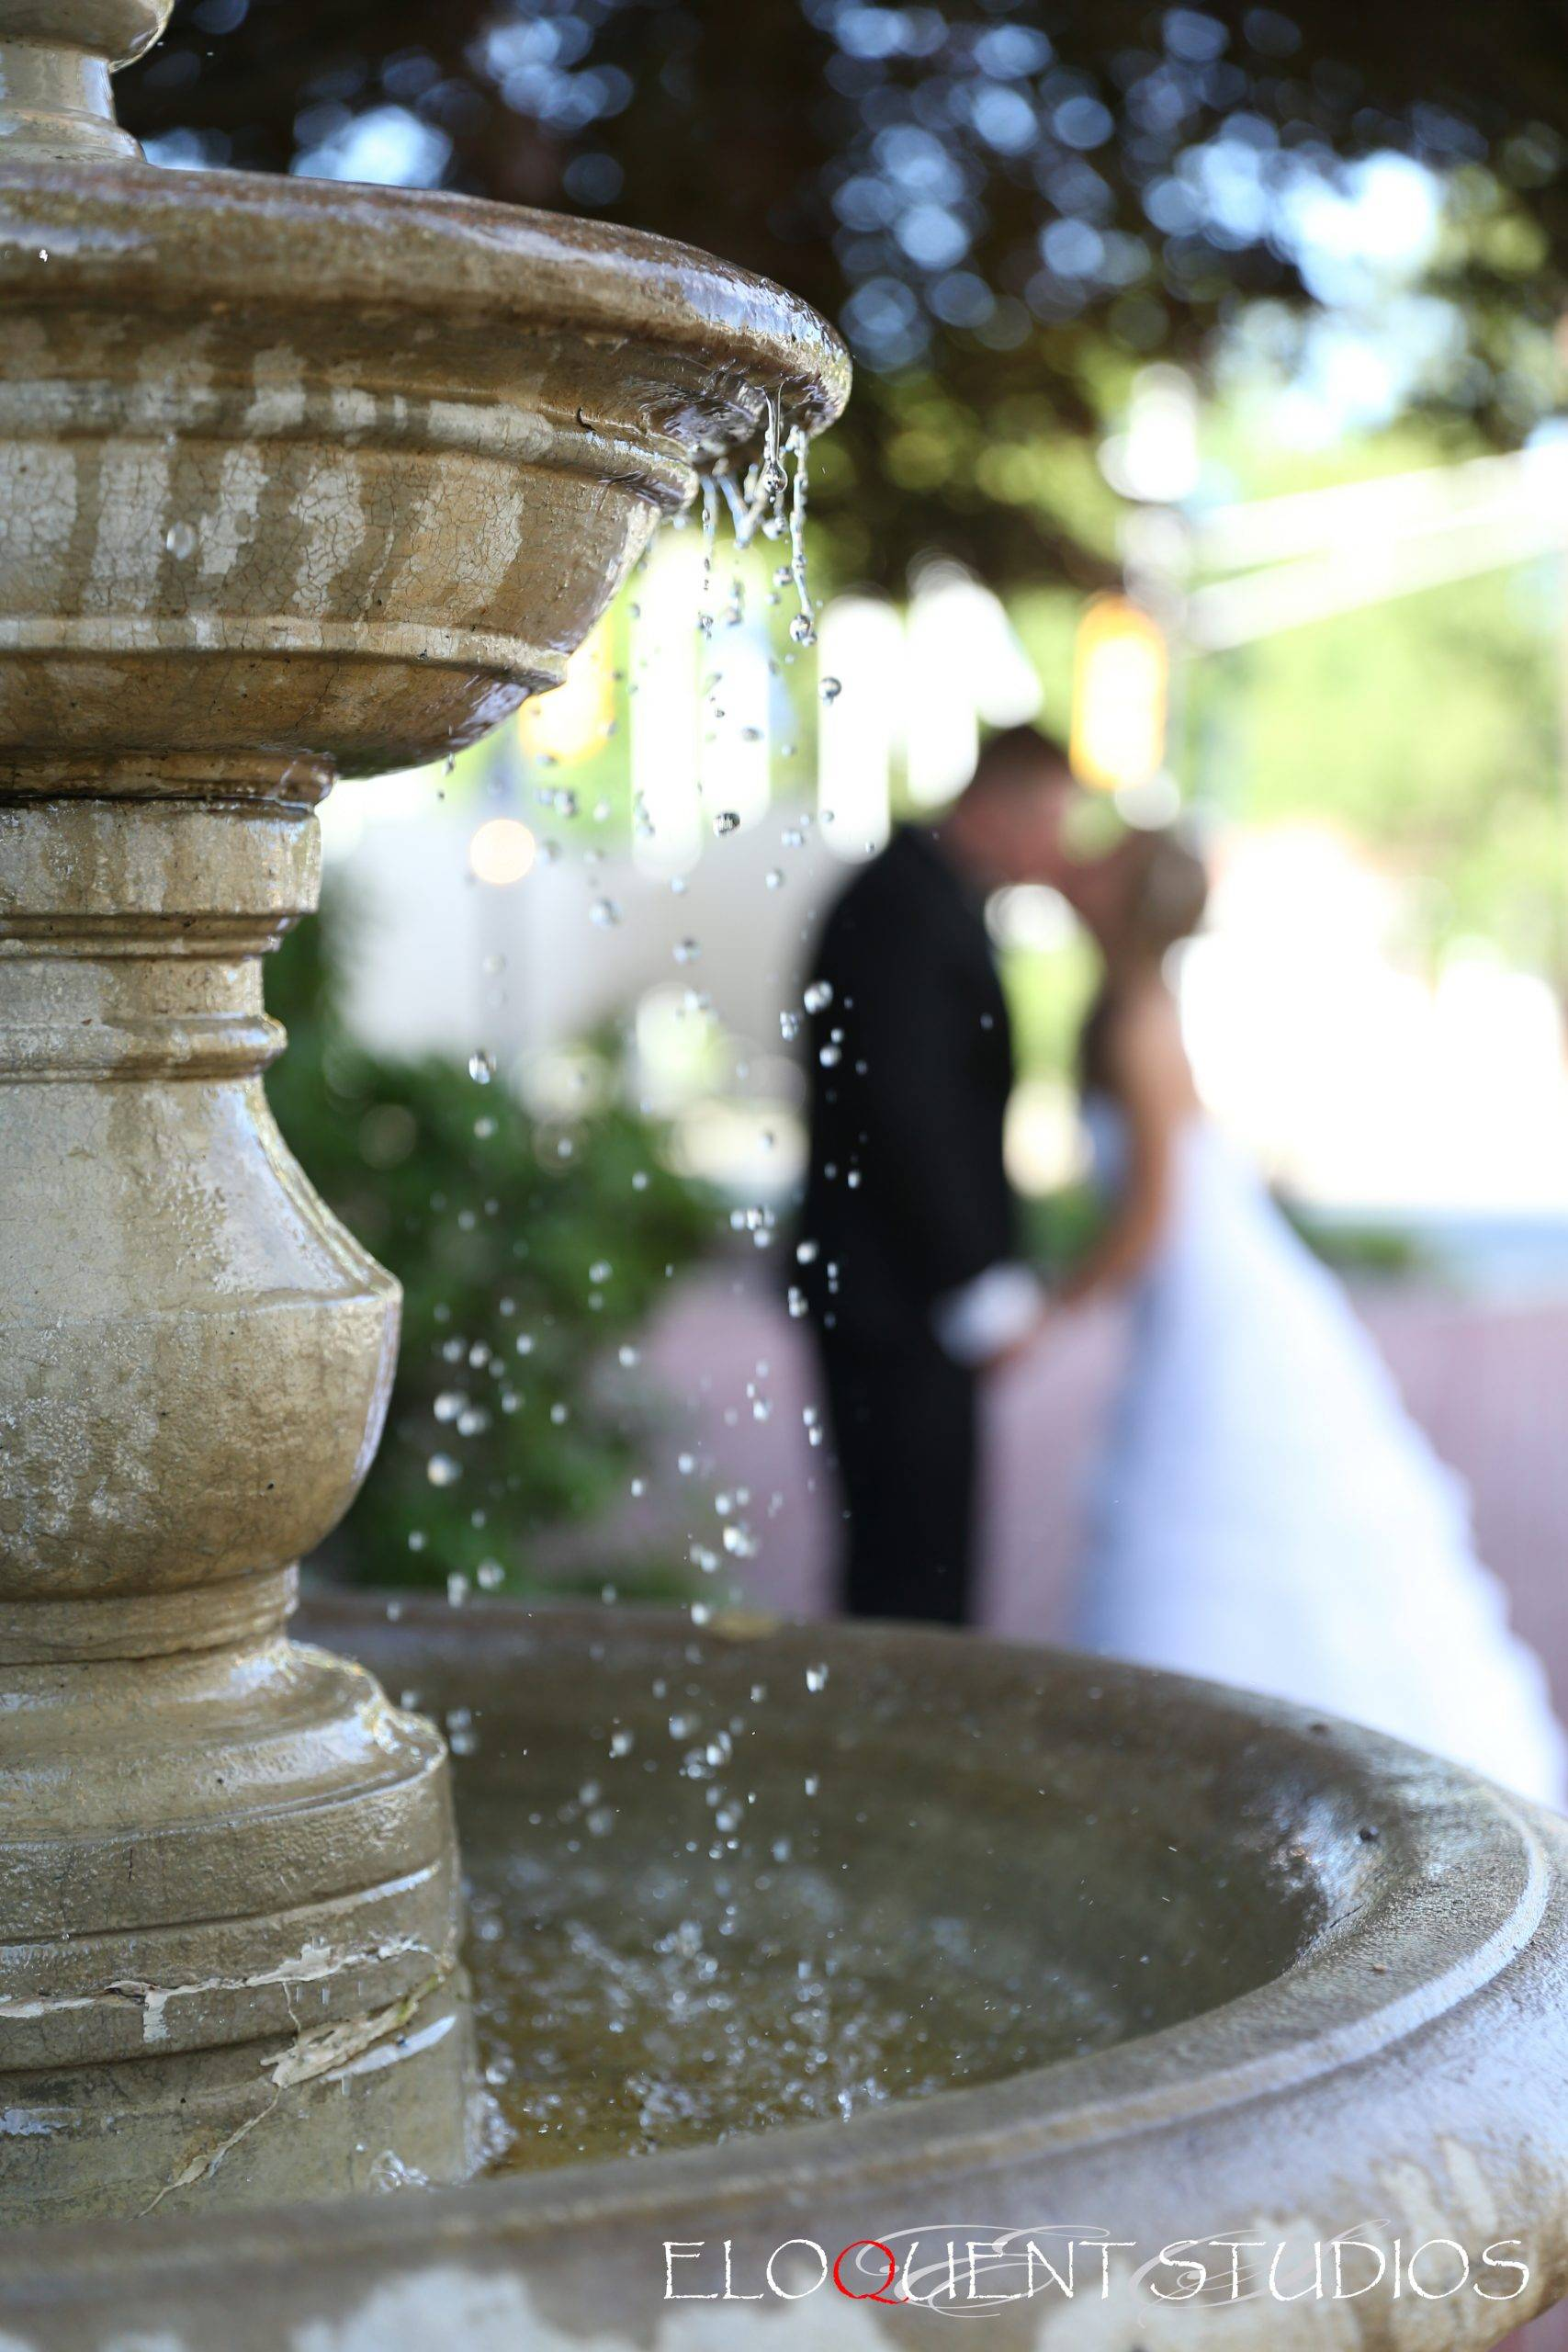 David's Country Inn kiss by the fountain